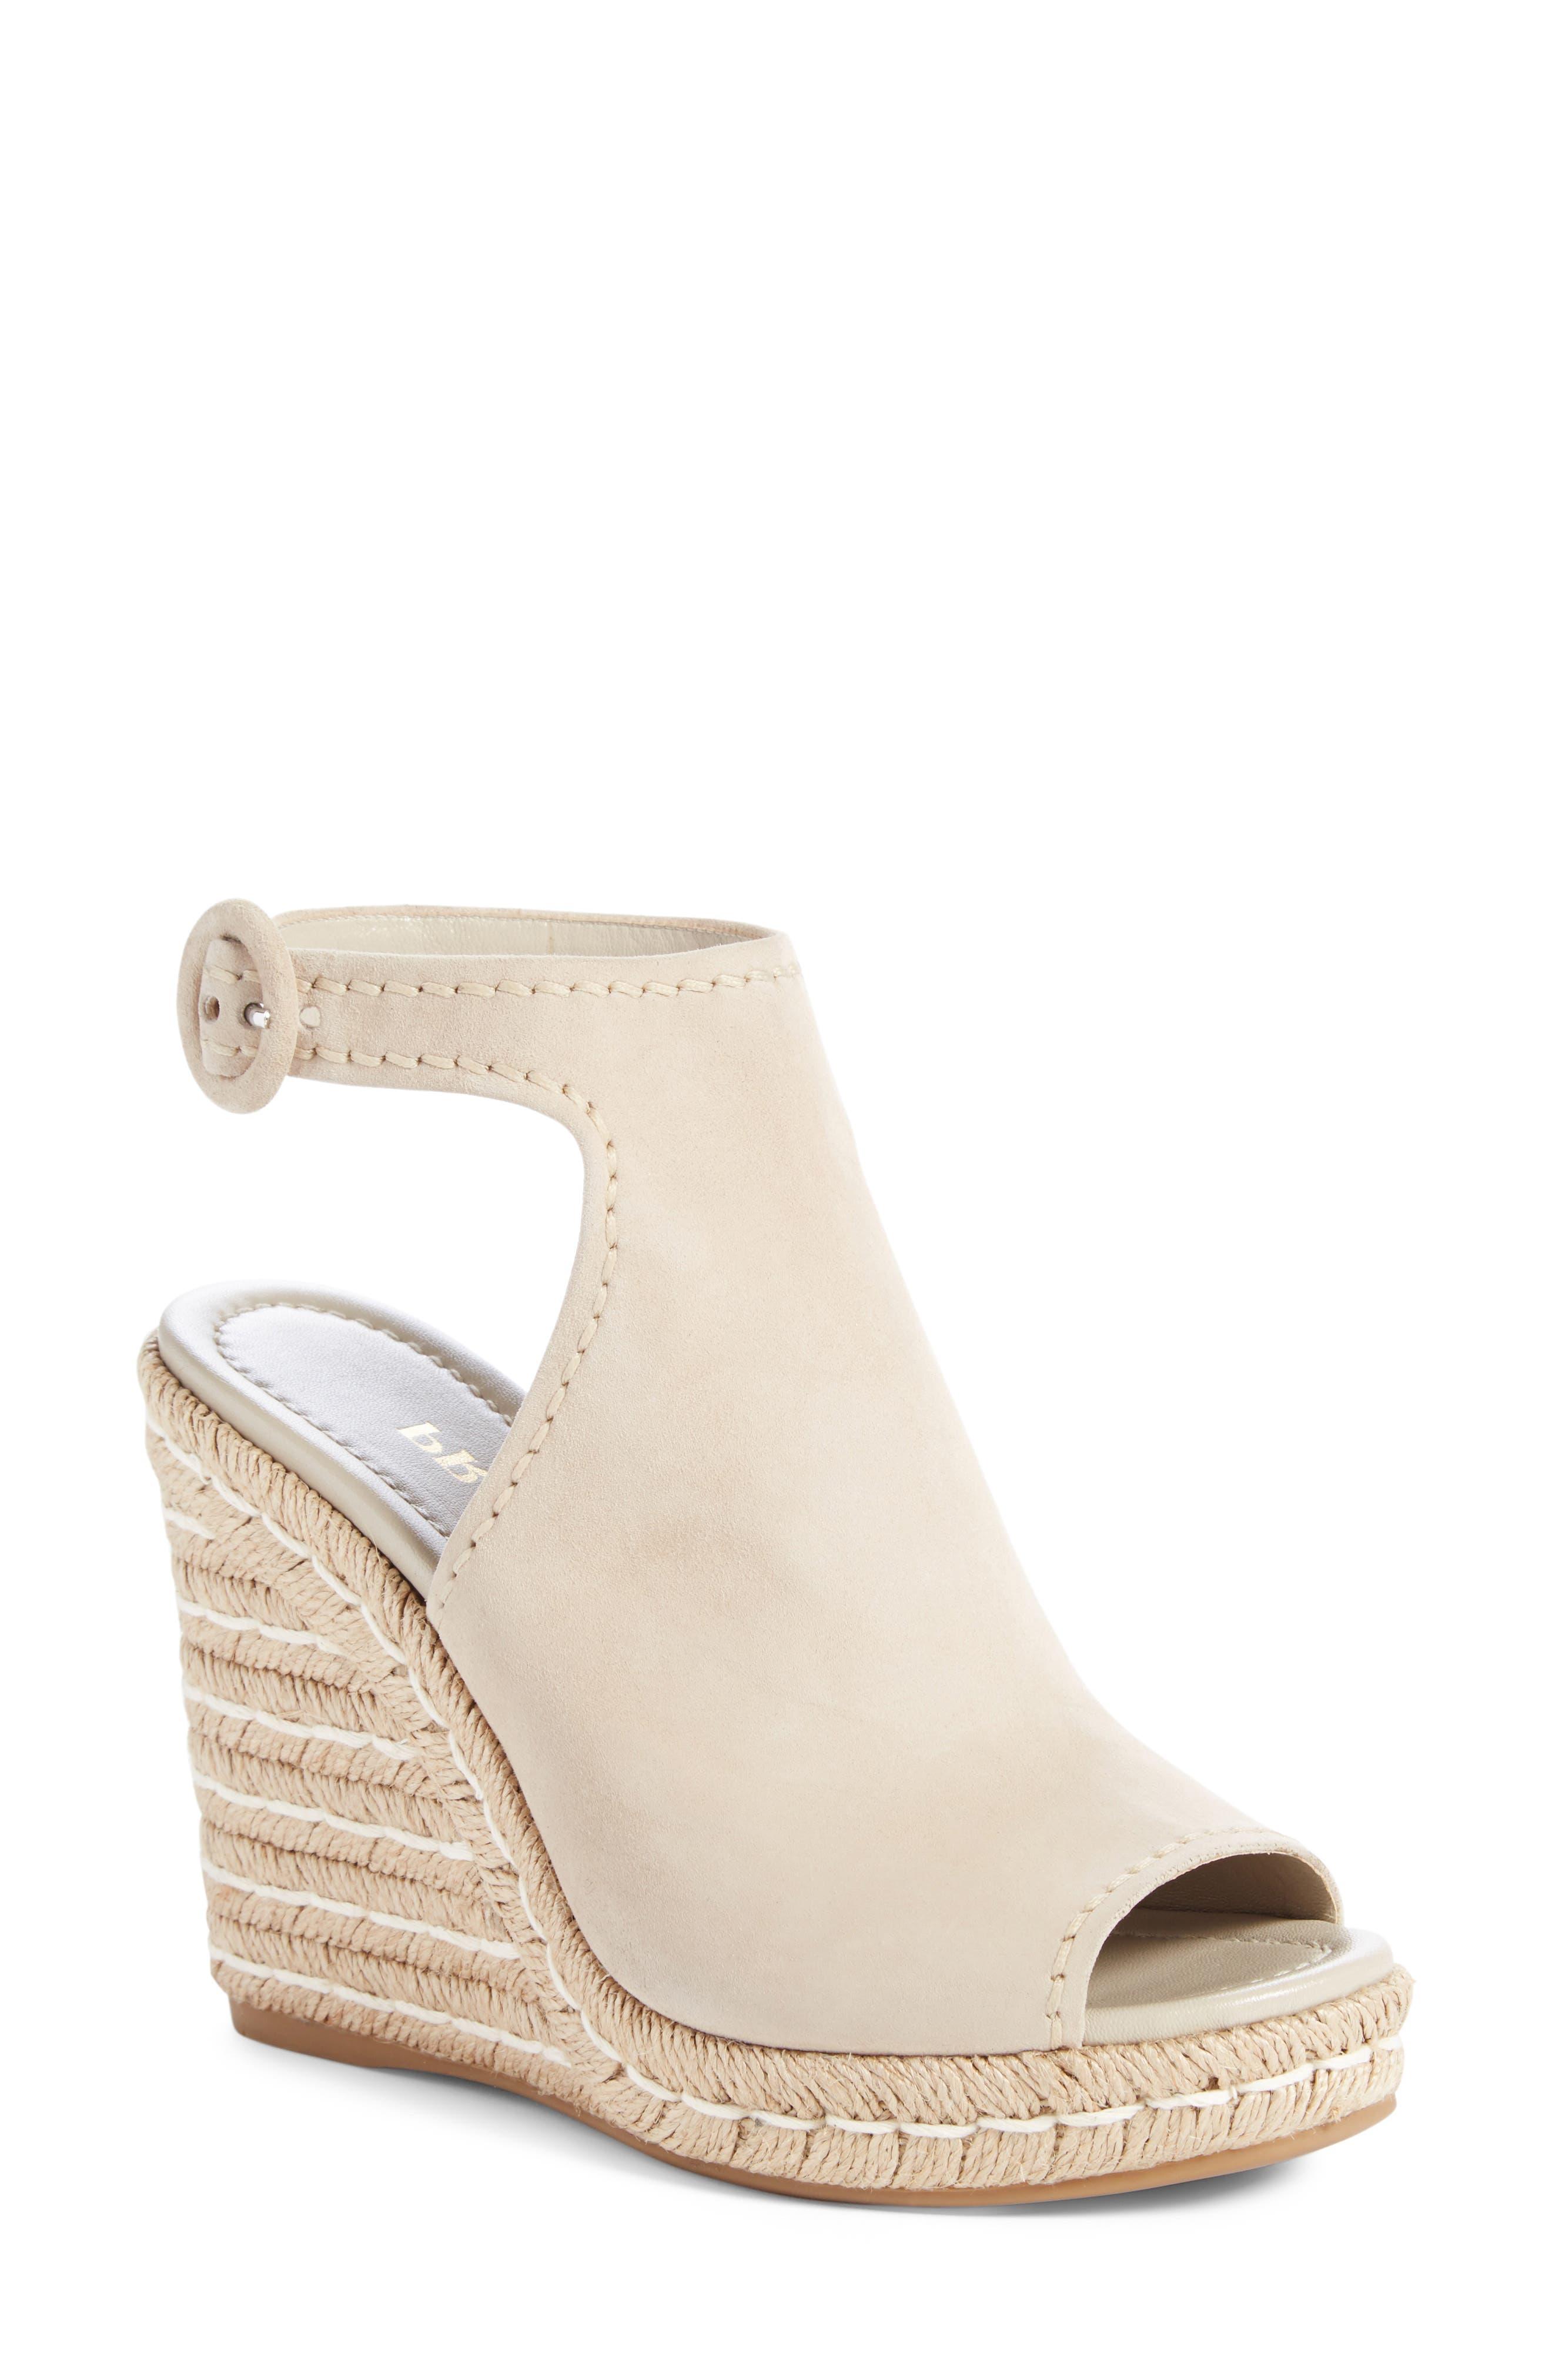 PRADA Ankle Strap Espadrille Wedge Sandal